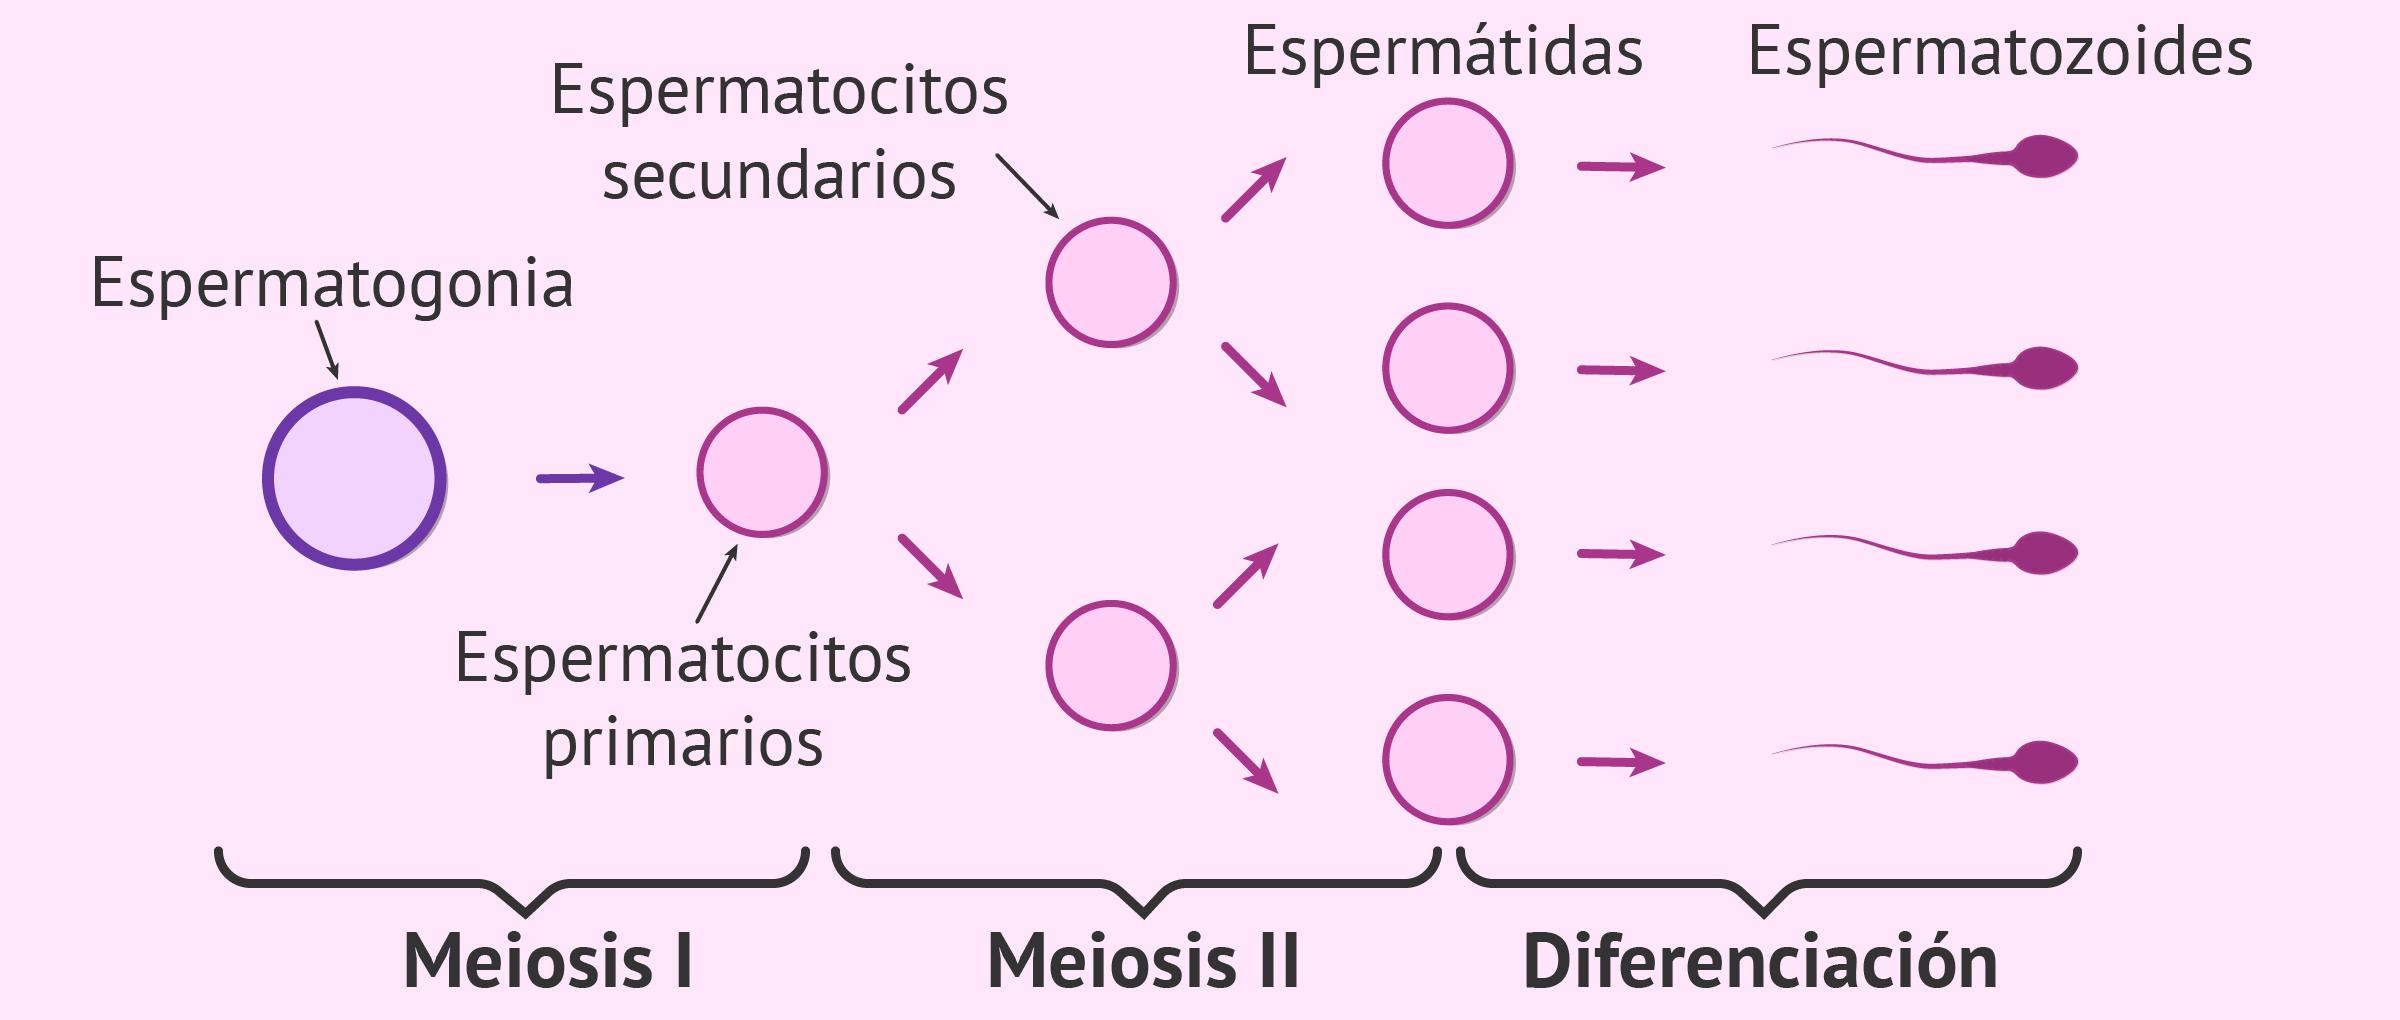 Proceso de la espermatogénesis